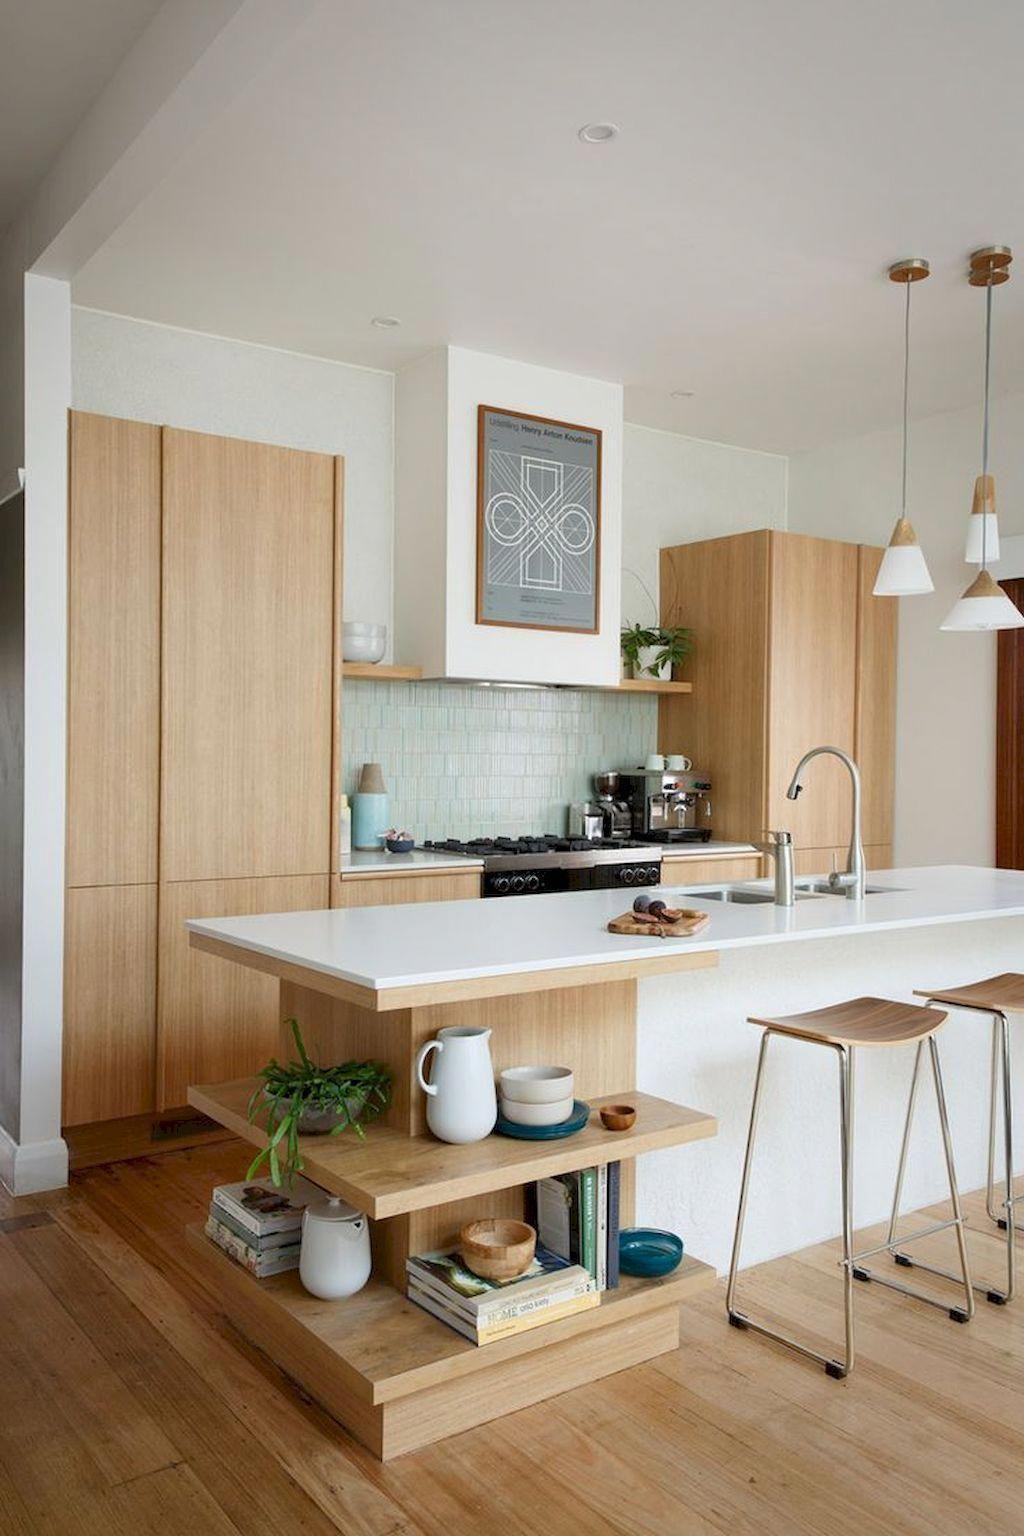 Modern Kitchen Design Rift Sawn White Oak Cabinets With Waterfall Double Isl Modern Kitchen Design Mid Century Modern Kitchen Design Mid Century Modern Kitchen